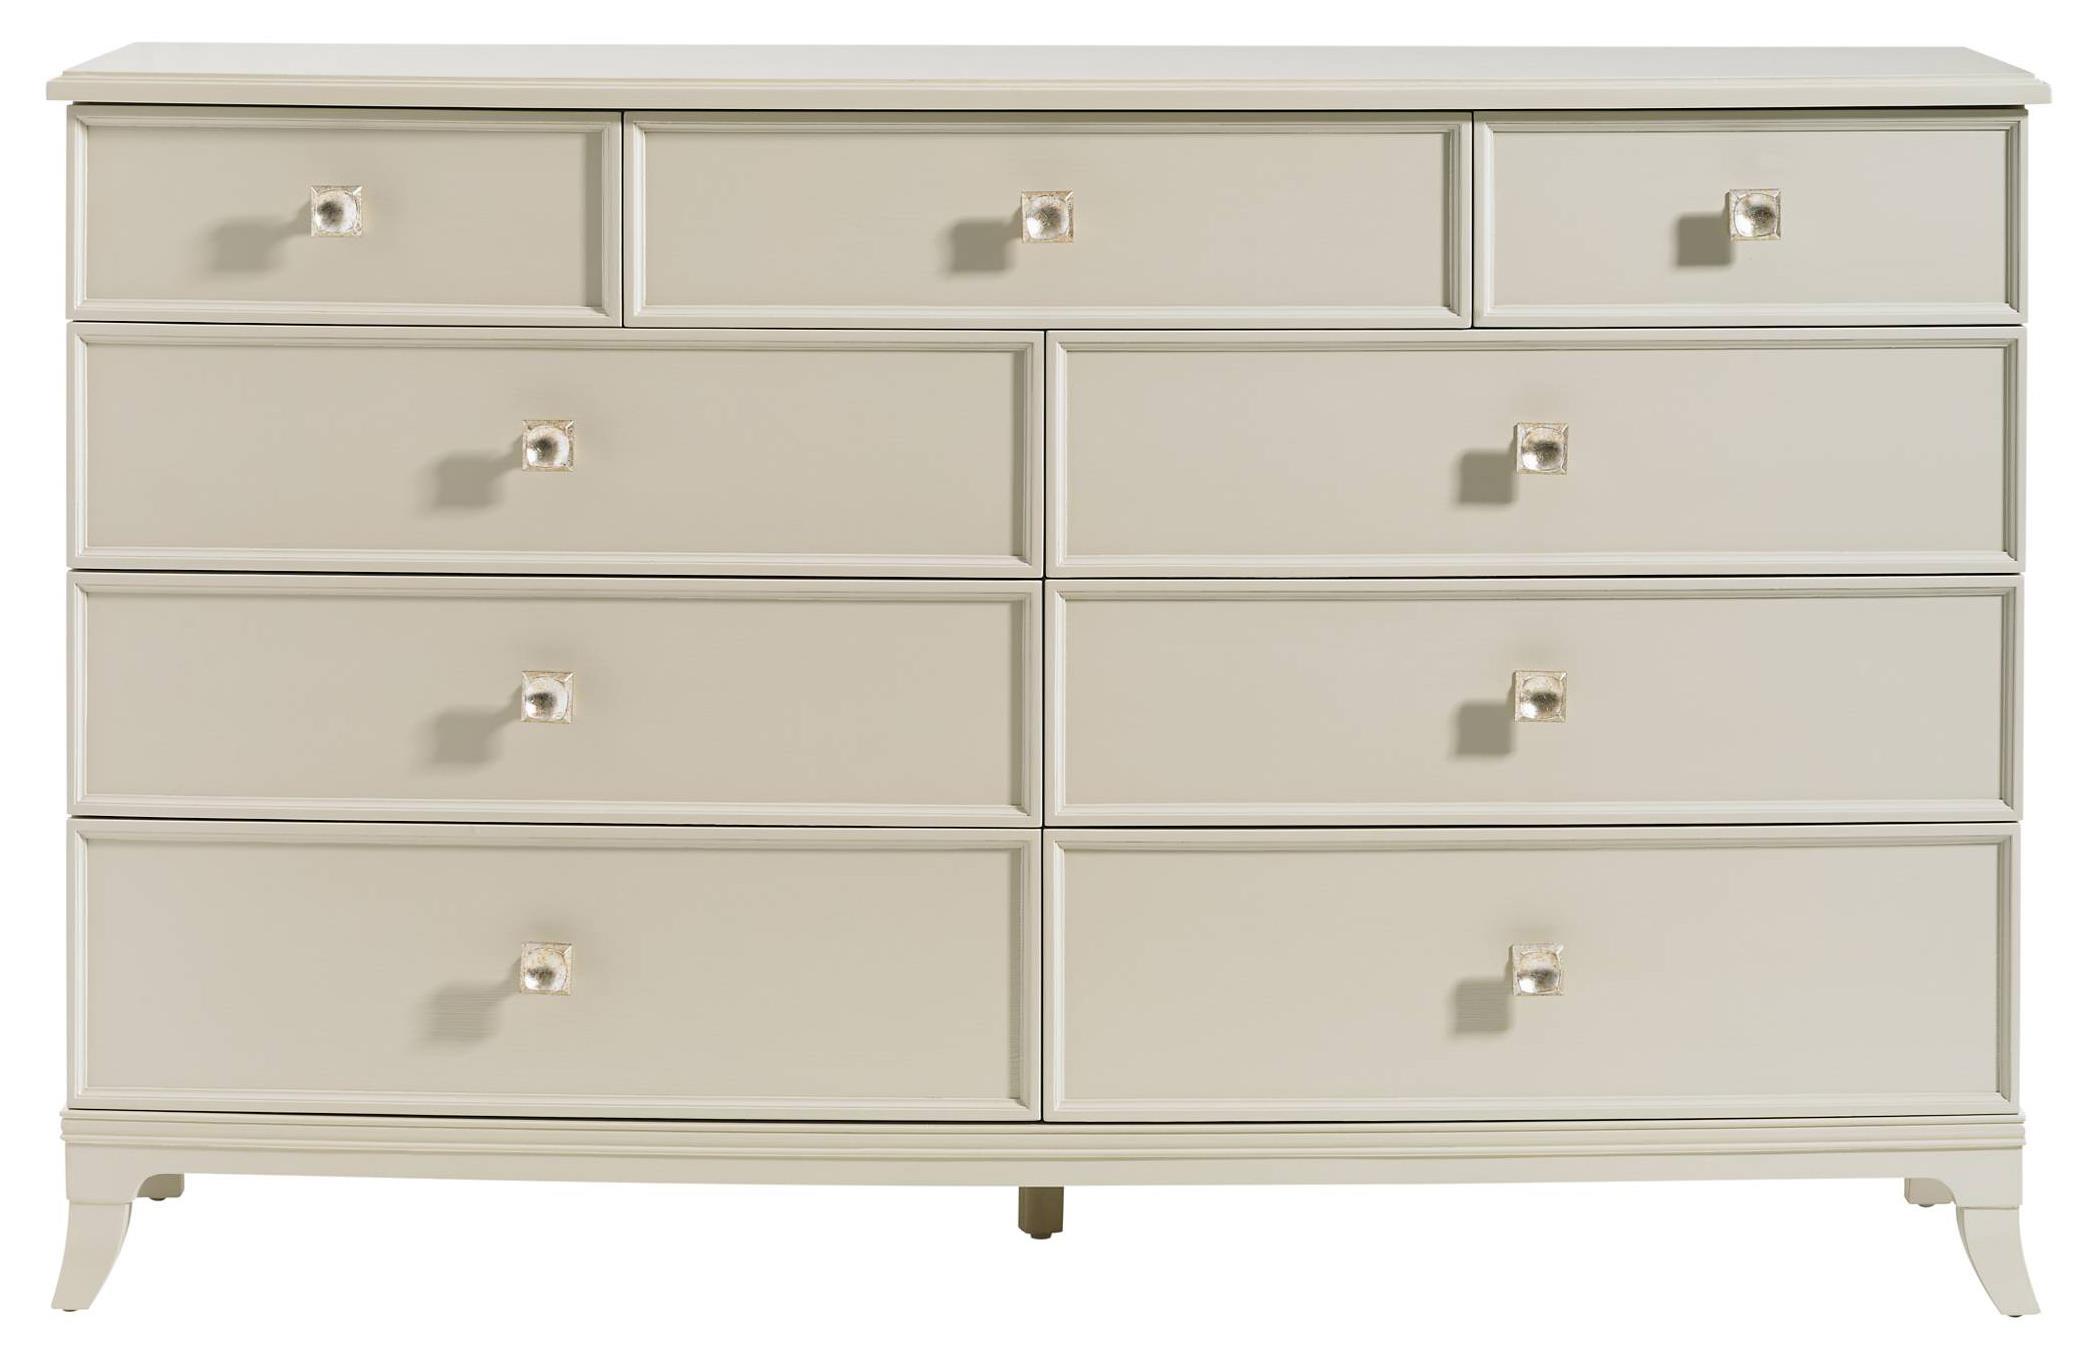 Stanley Furniture Crestaire Ladera Dresser - Item Number: 436-23-05